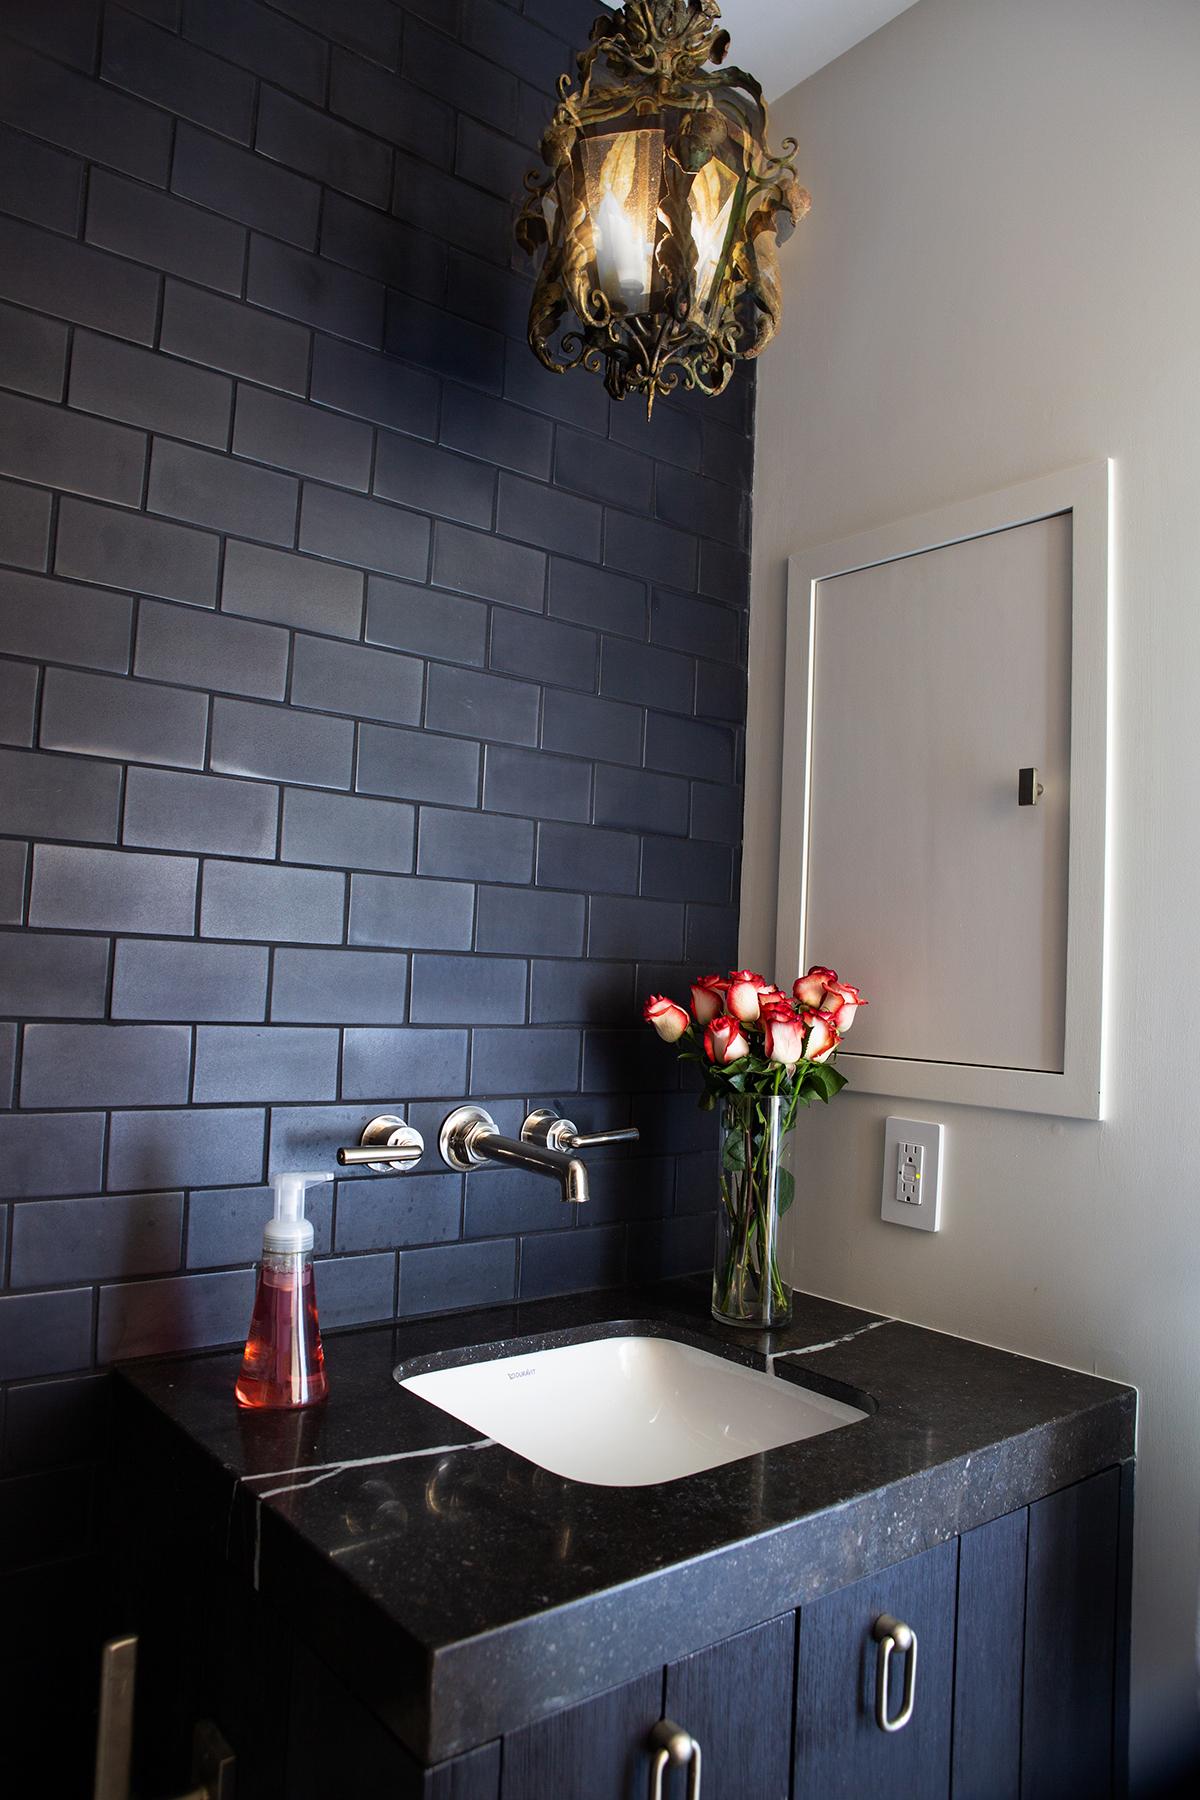 black bathroom 4x6.jpg